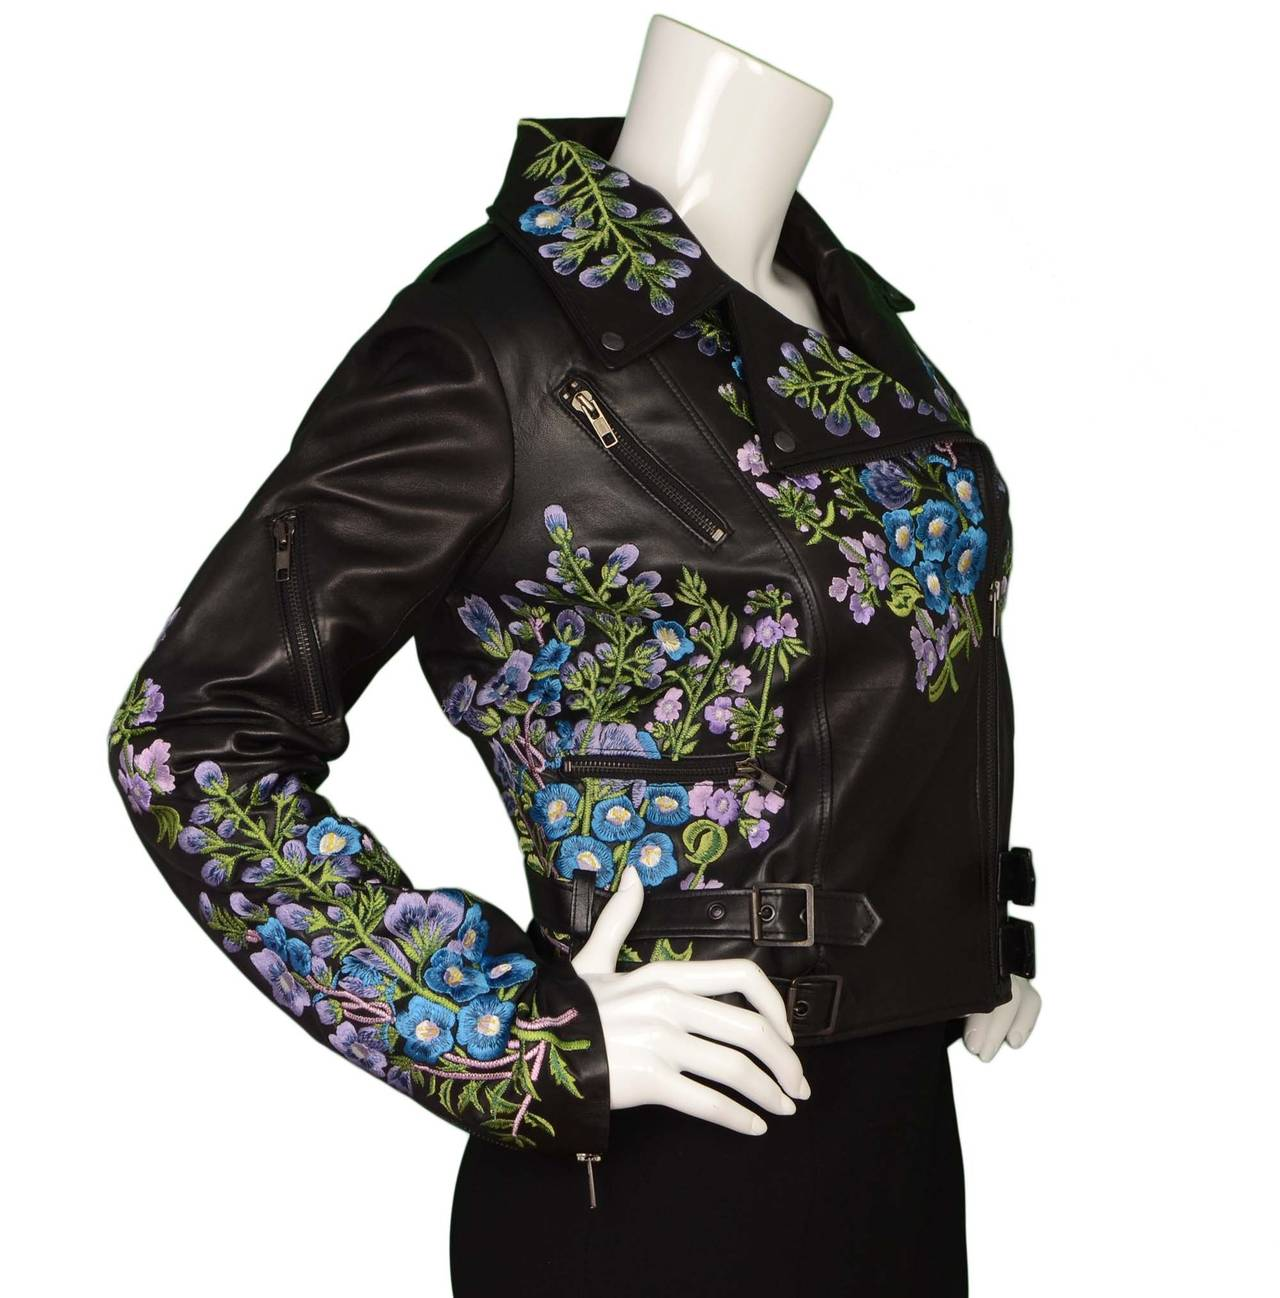 Christopher Kane Floral Embroidered Black Leather Jacket Sz 10 For